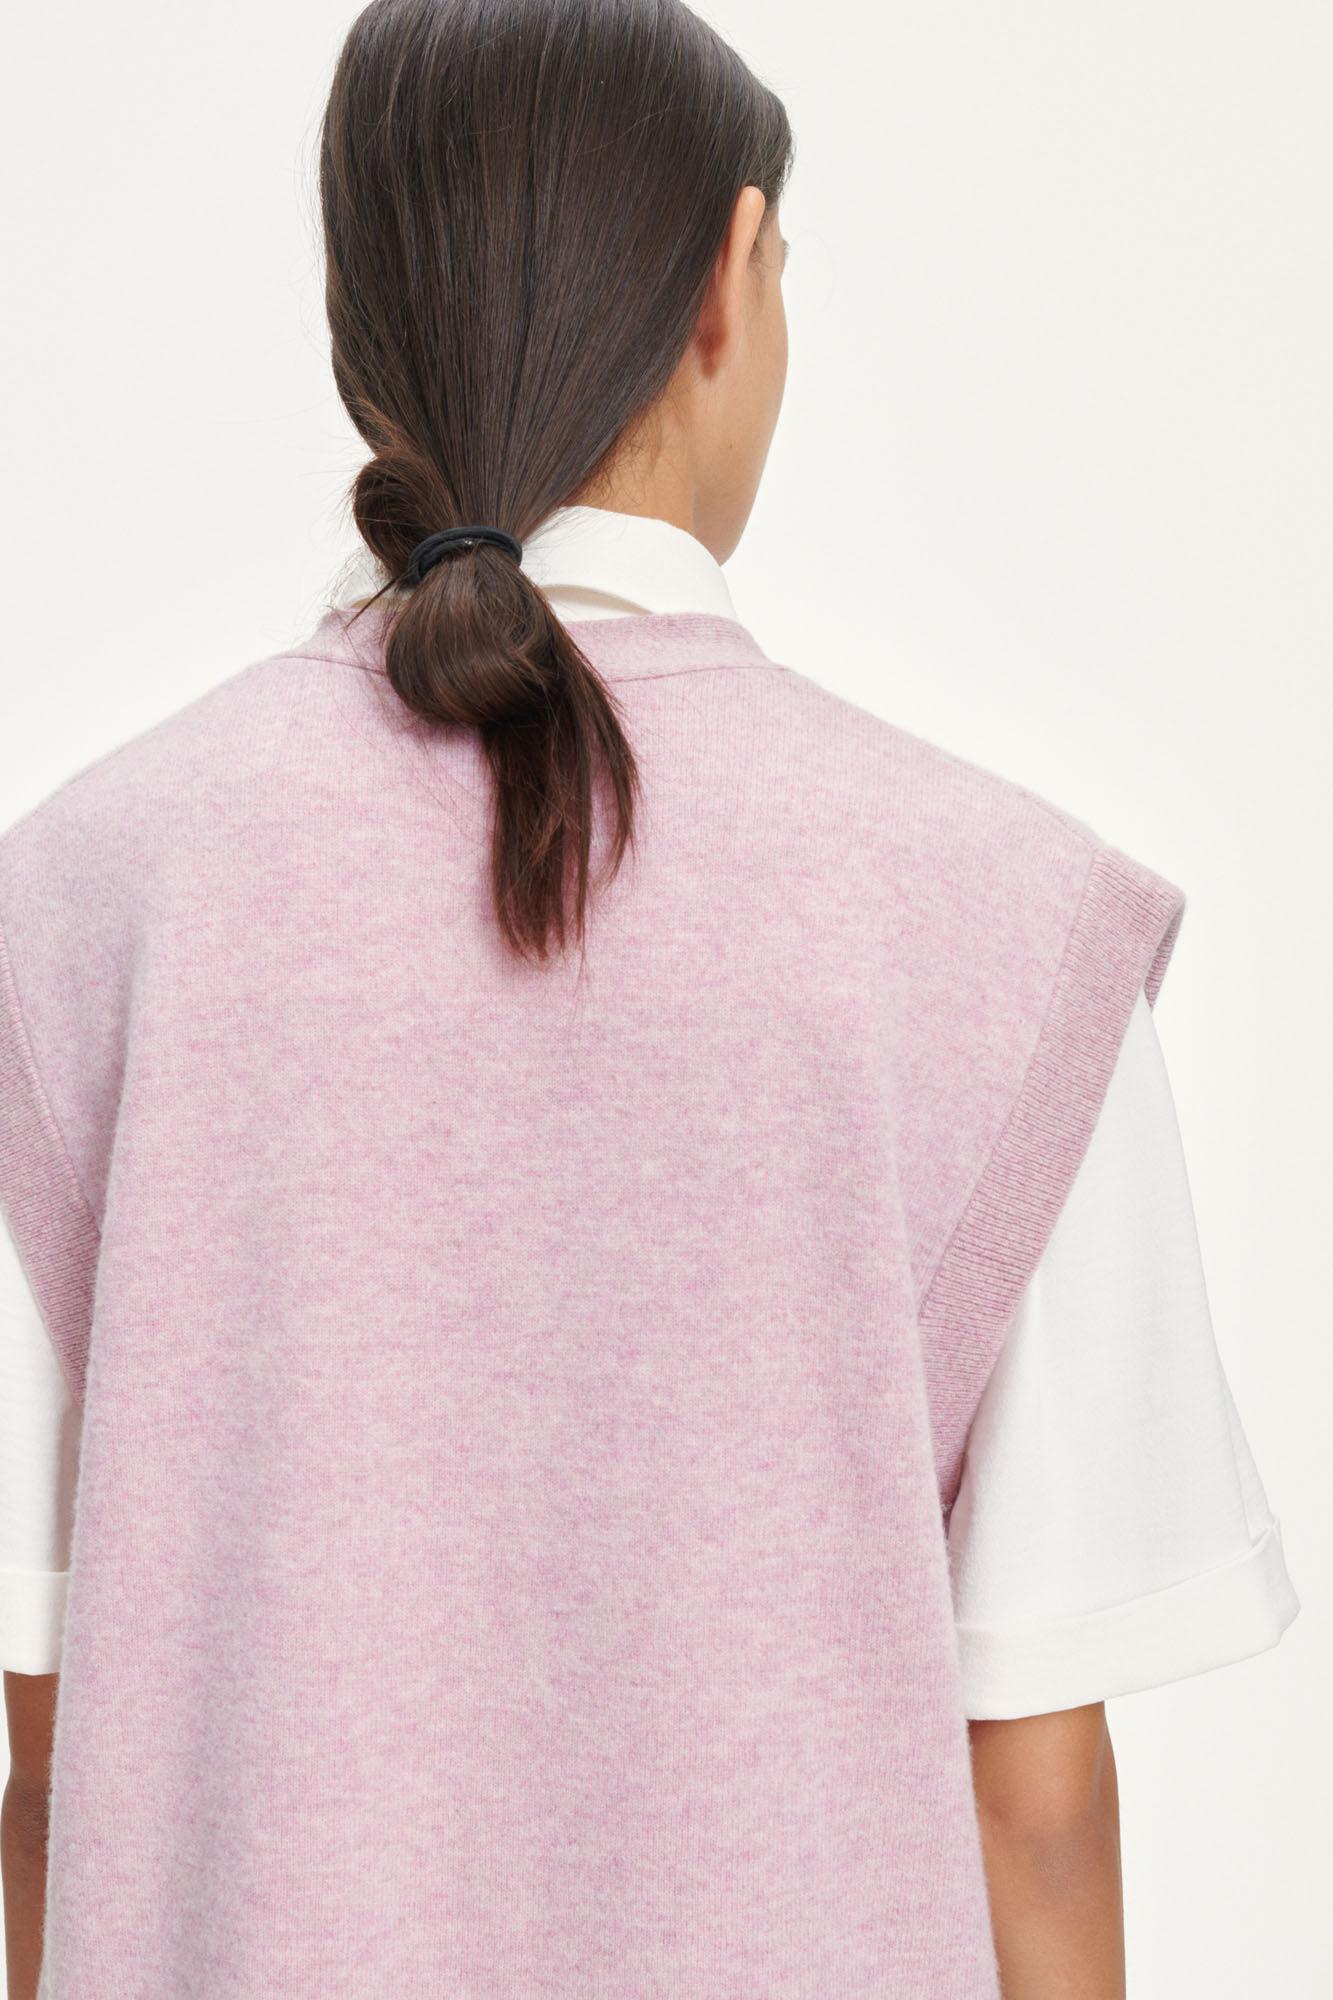 Amaris cardigan vest 12758, MAUVE SHADOW MEL.